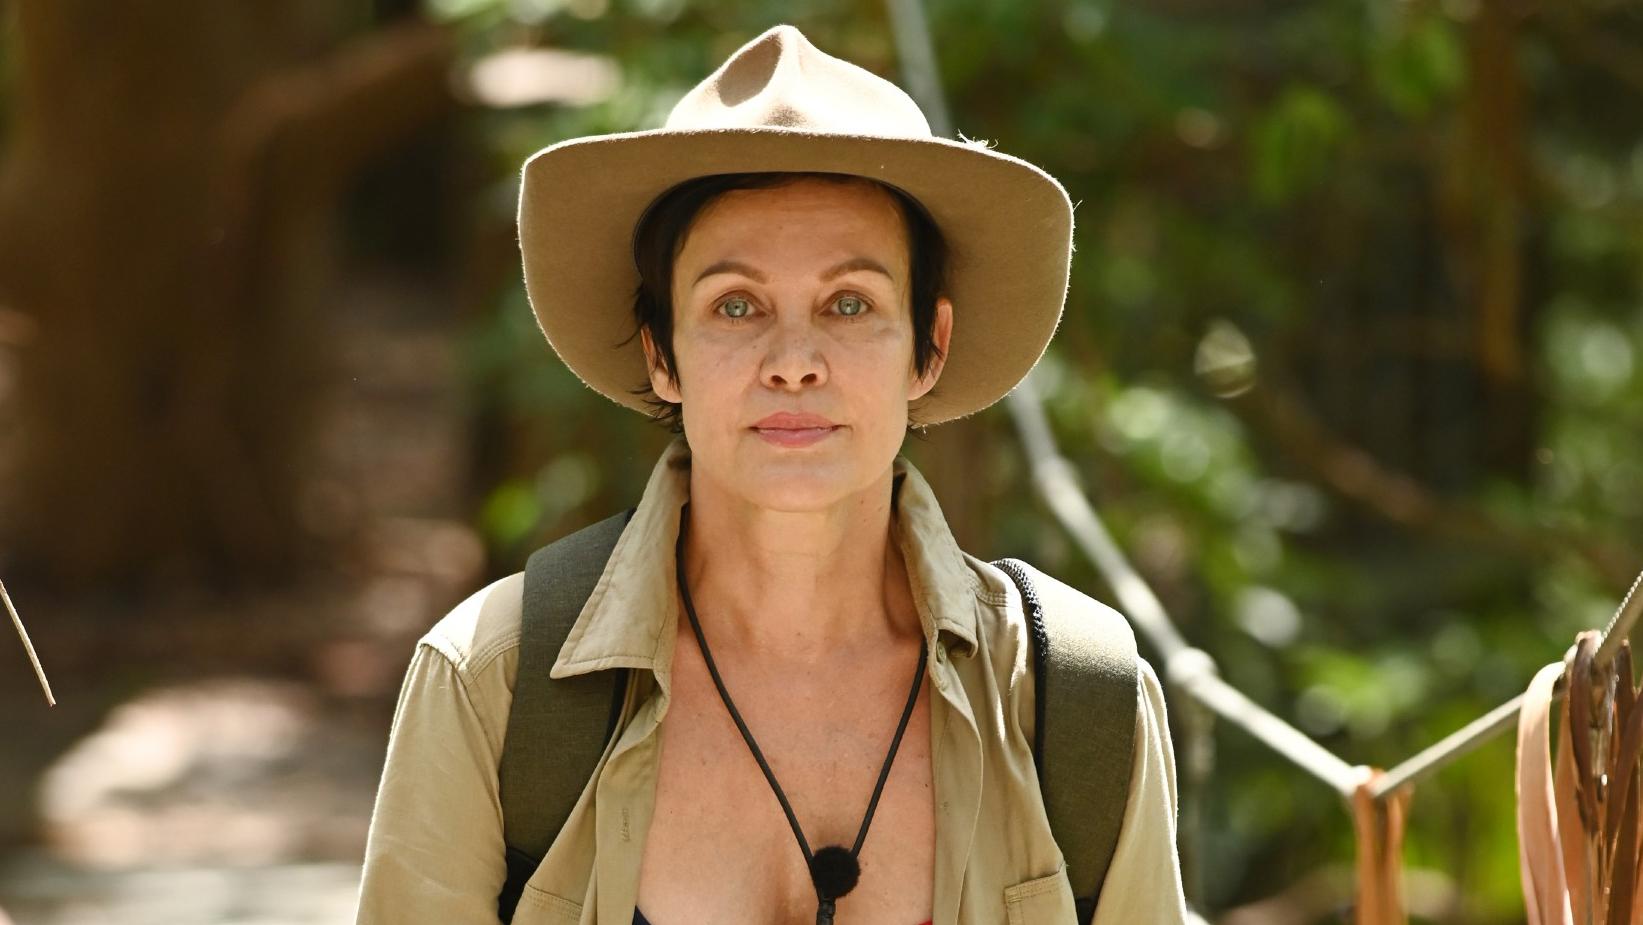 Dschungelcamp 2020 Sonja Auszug Interview